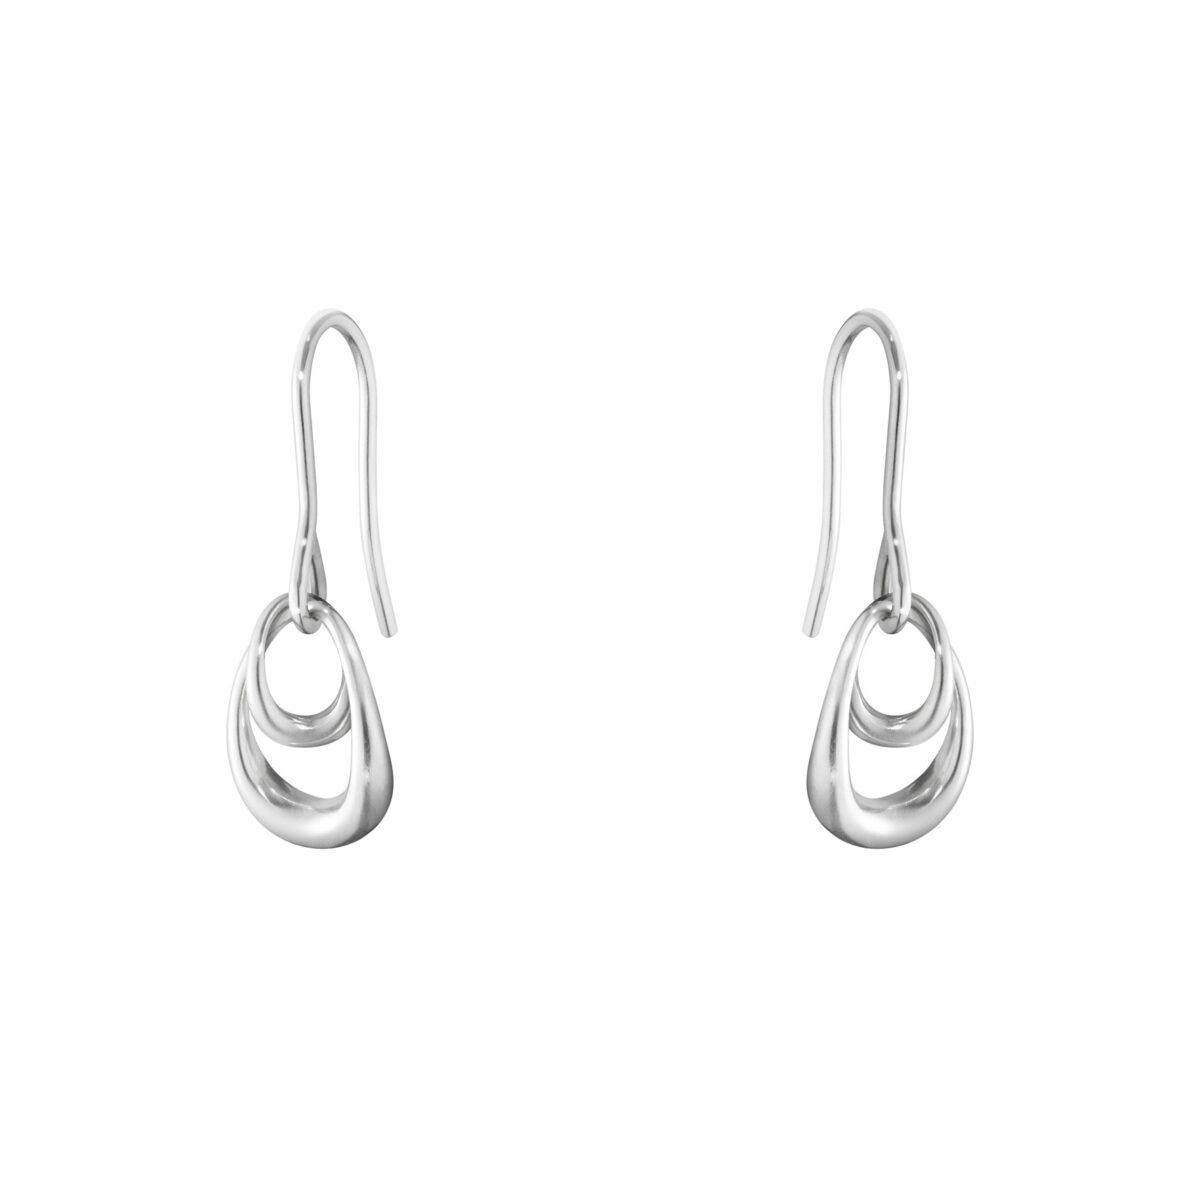 product/1/0/10012312_offspring_earrings_433a_si_aus_jpg_max_3000x3000_423927.jpg